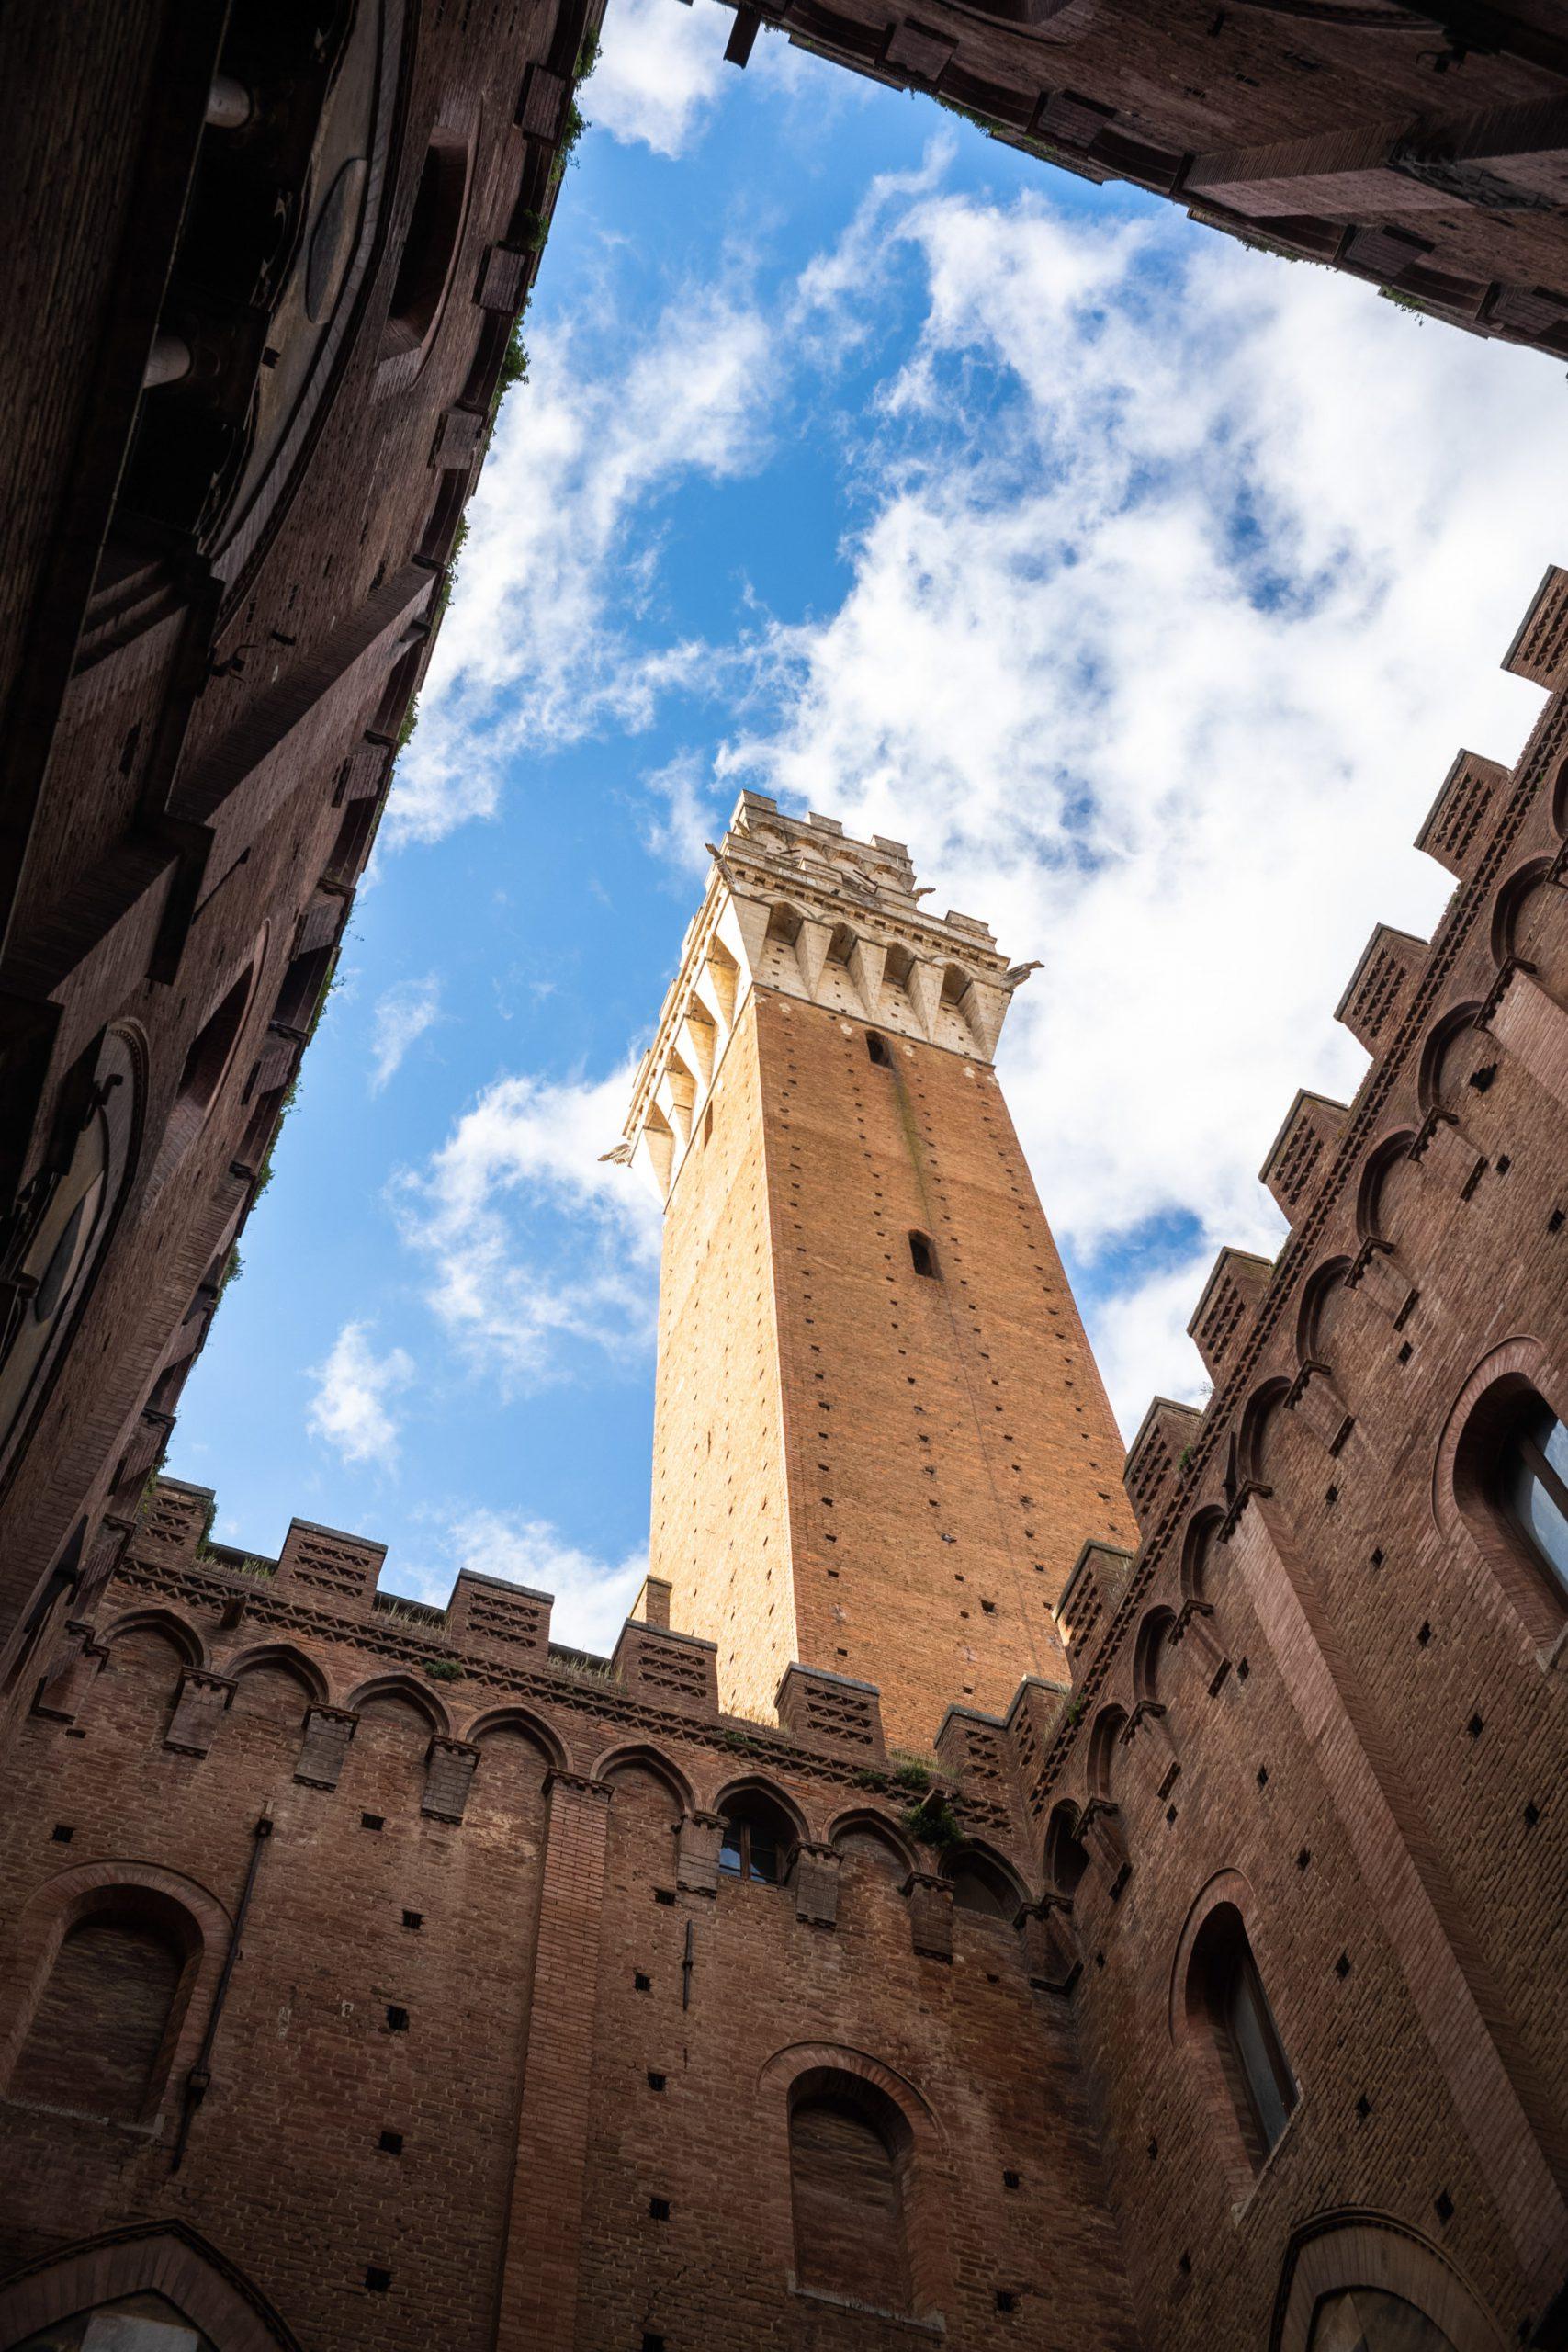 Torre del Mangia/Siena. Leica M10 mit 35mm Summicron